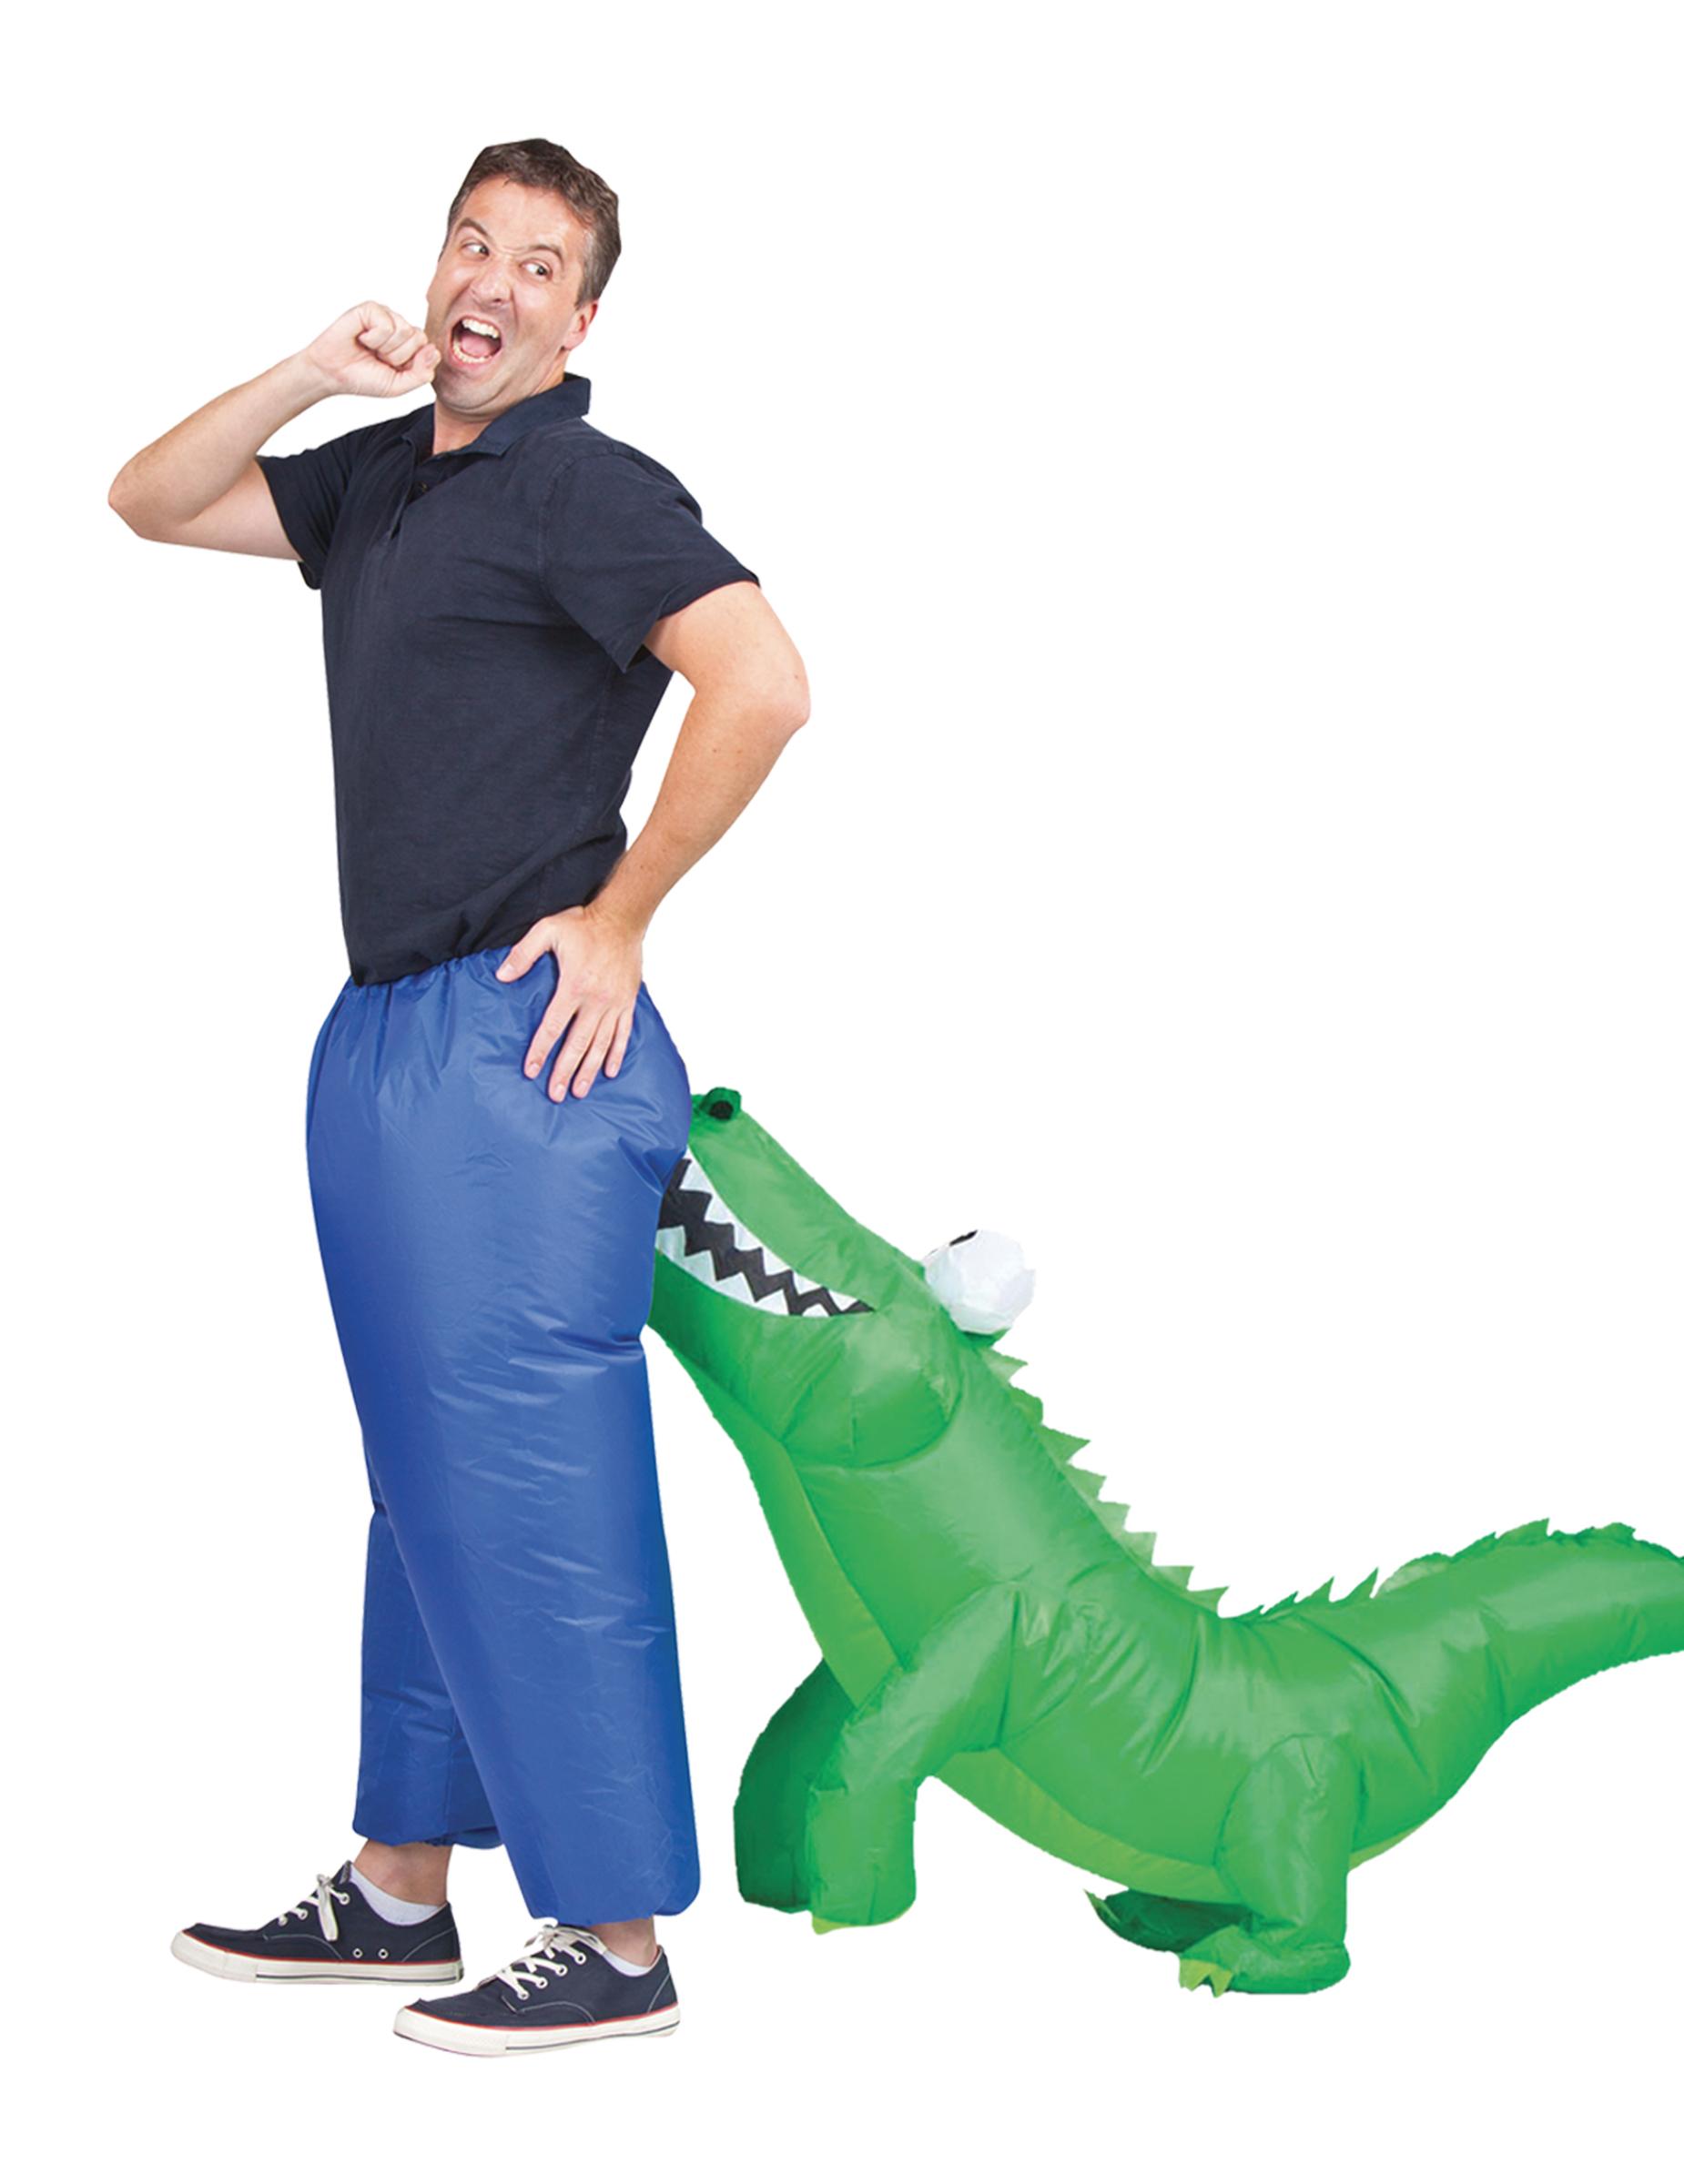 aufblasbares krokodilbiss kost m kost me f r erwachsene und g nstige faschingskost me vegaoo. Black Bedroom Furniture Sets. Home Design Ideas